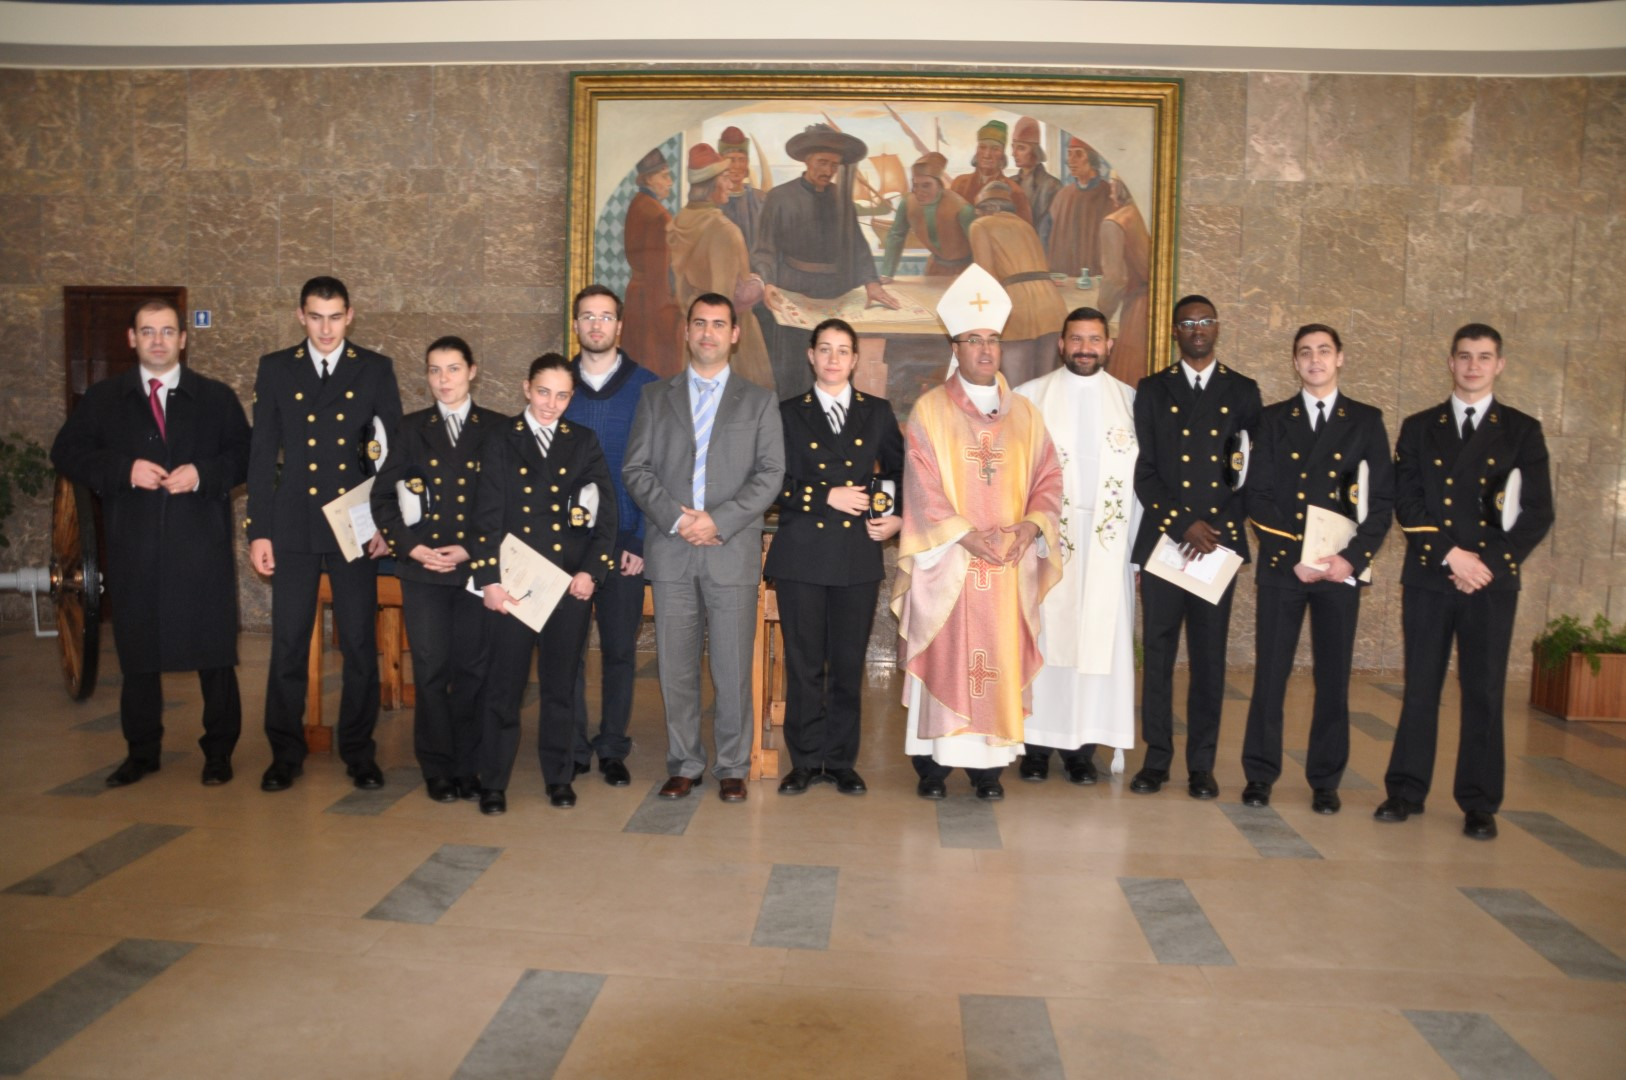 Sacramentos da Iniciacao Crista na Escola Naval